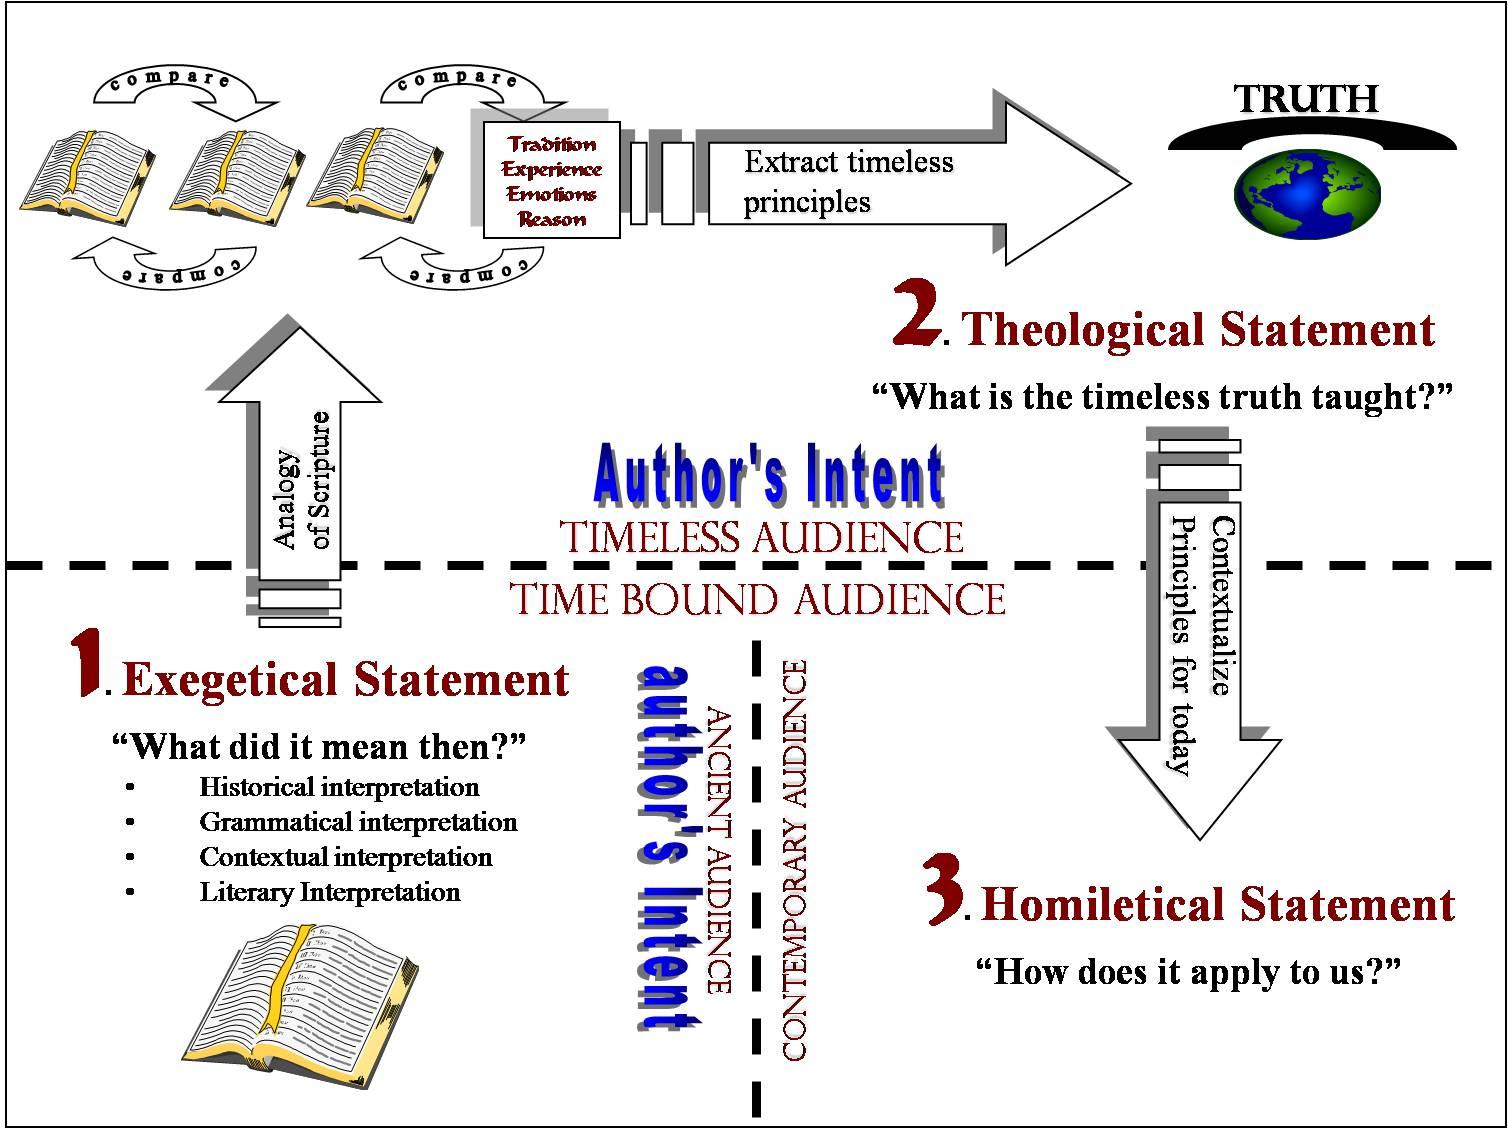 Biblical interpretation in a nutshell -http://www.reclaimingthemind.org/blog/2010/04/bible-interpretation-in-a-nutshell/